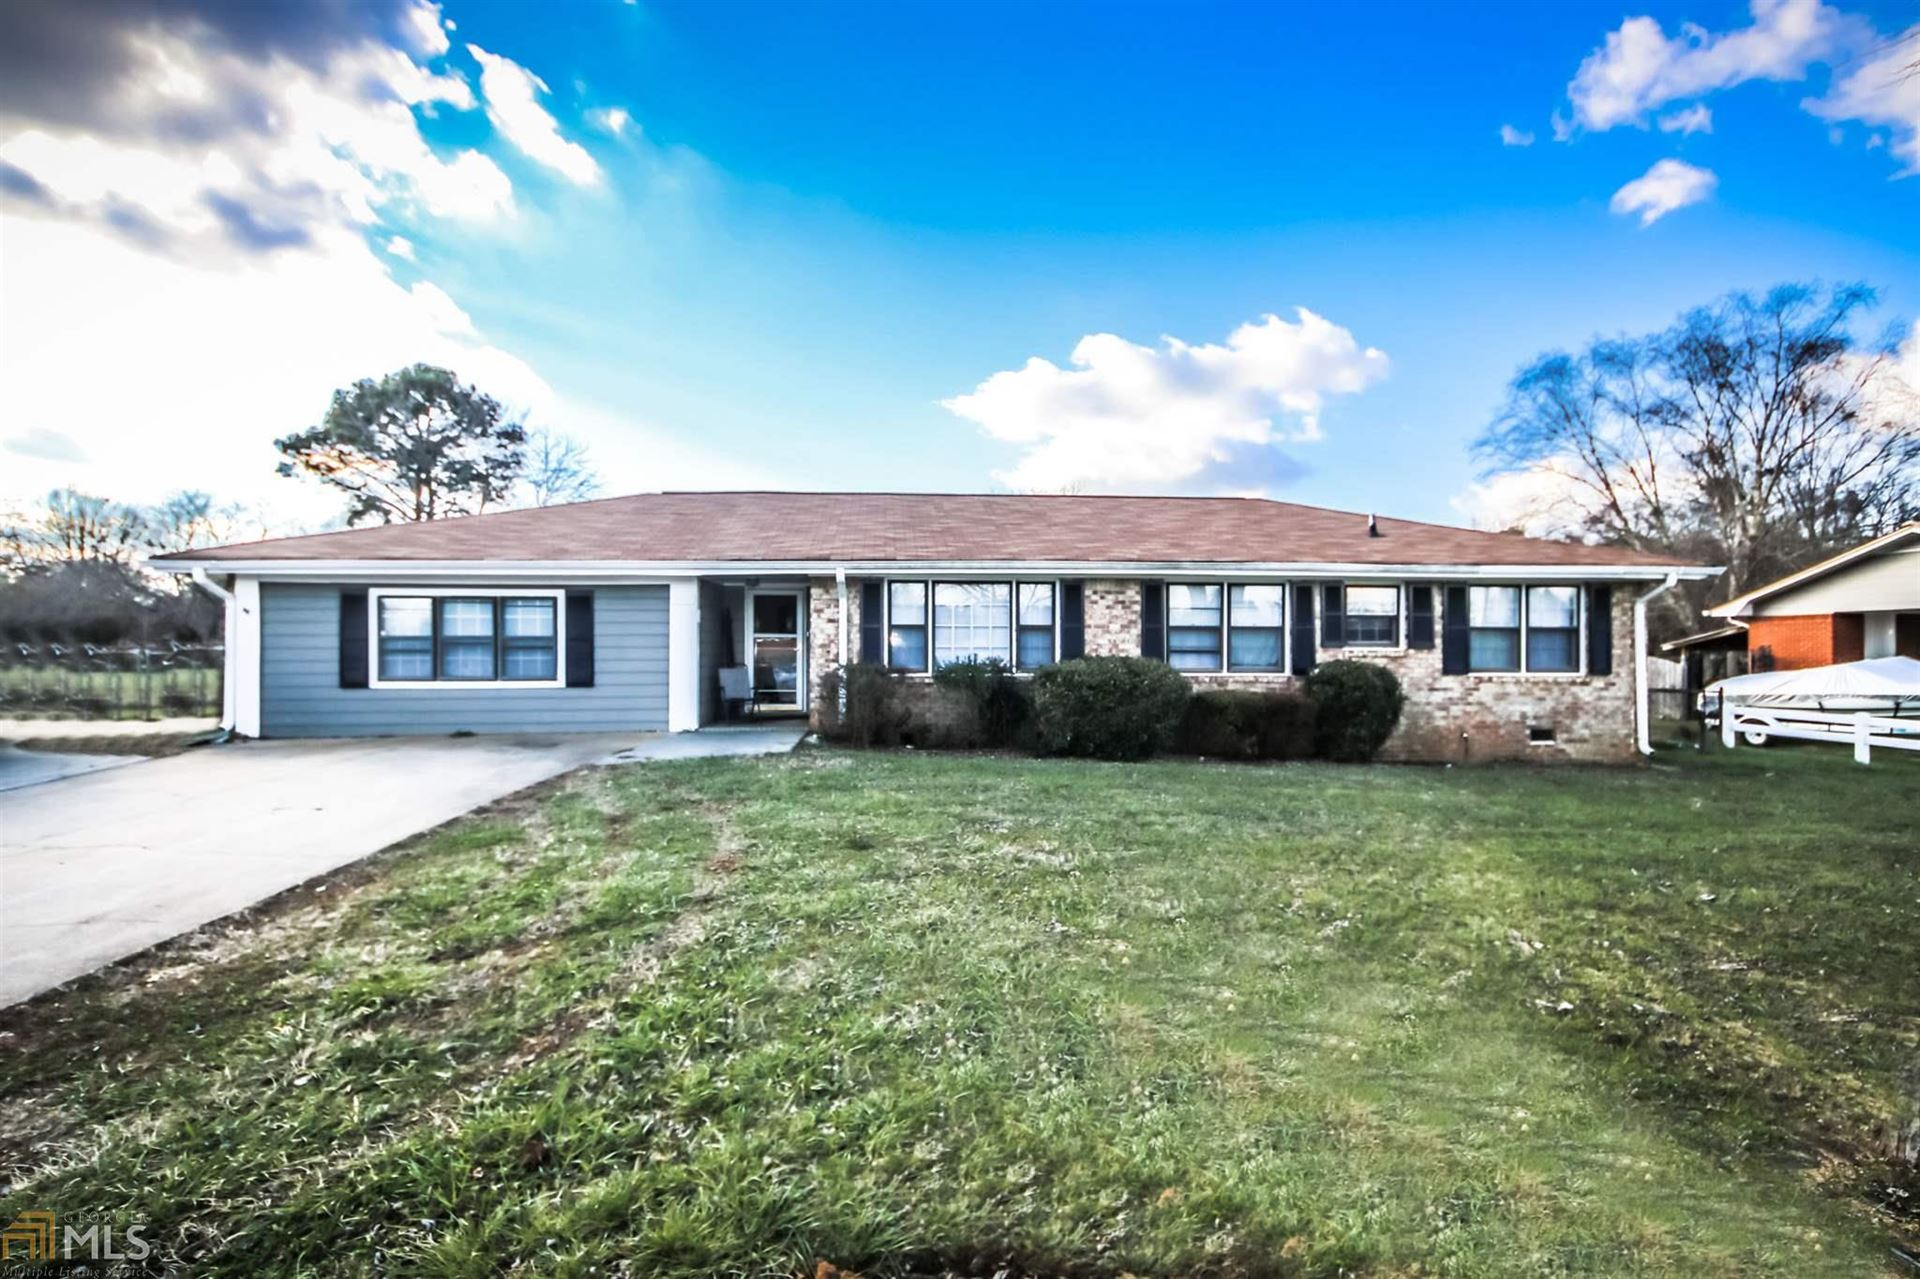 610 Grassdale Rd, Cartersville, GA 30121 - MLS#: 8909370